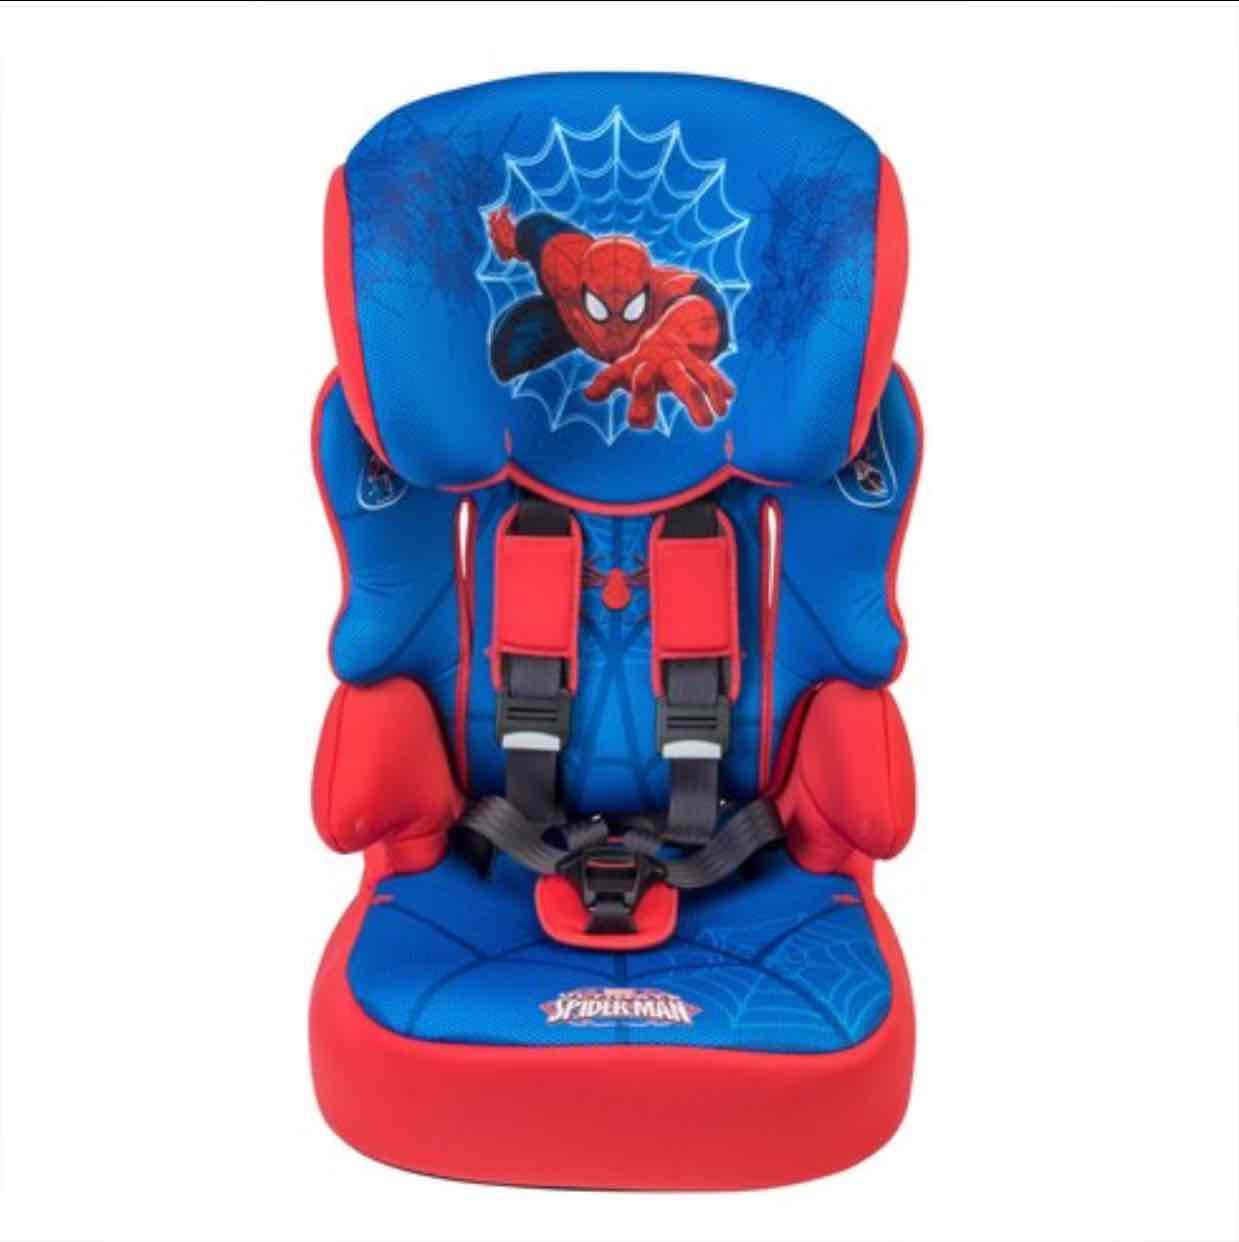 Marvel Spiderman Beline SP Group 1-2-3 Car Seat £36.99 from kiddicare